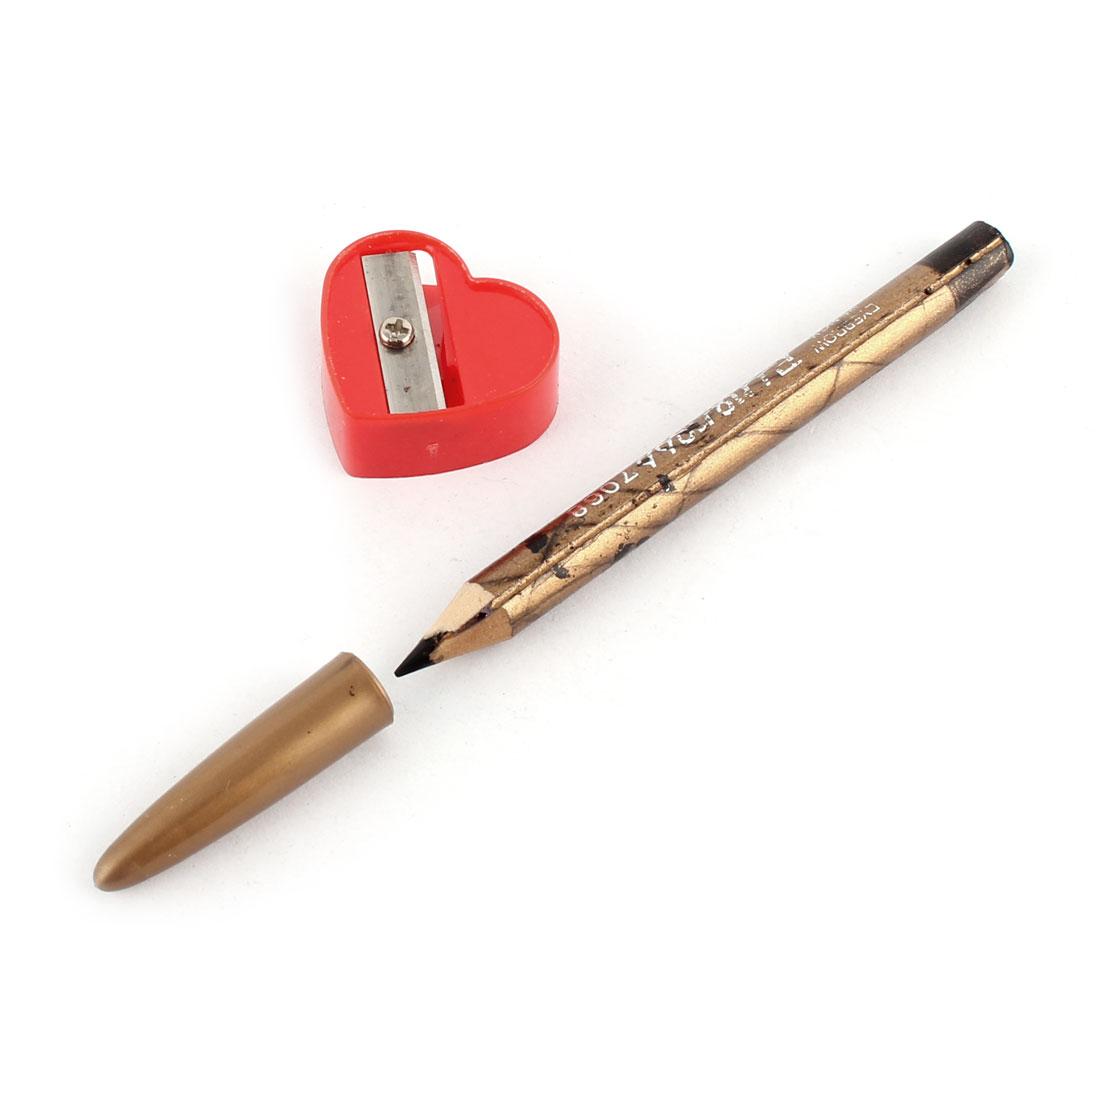 Black Nib Cosmetics Eyebrow Eyeliner Eye Lip Liner Pencil Sharpener Beauty Care Tool 2 in 1